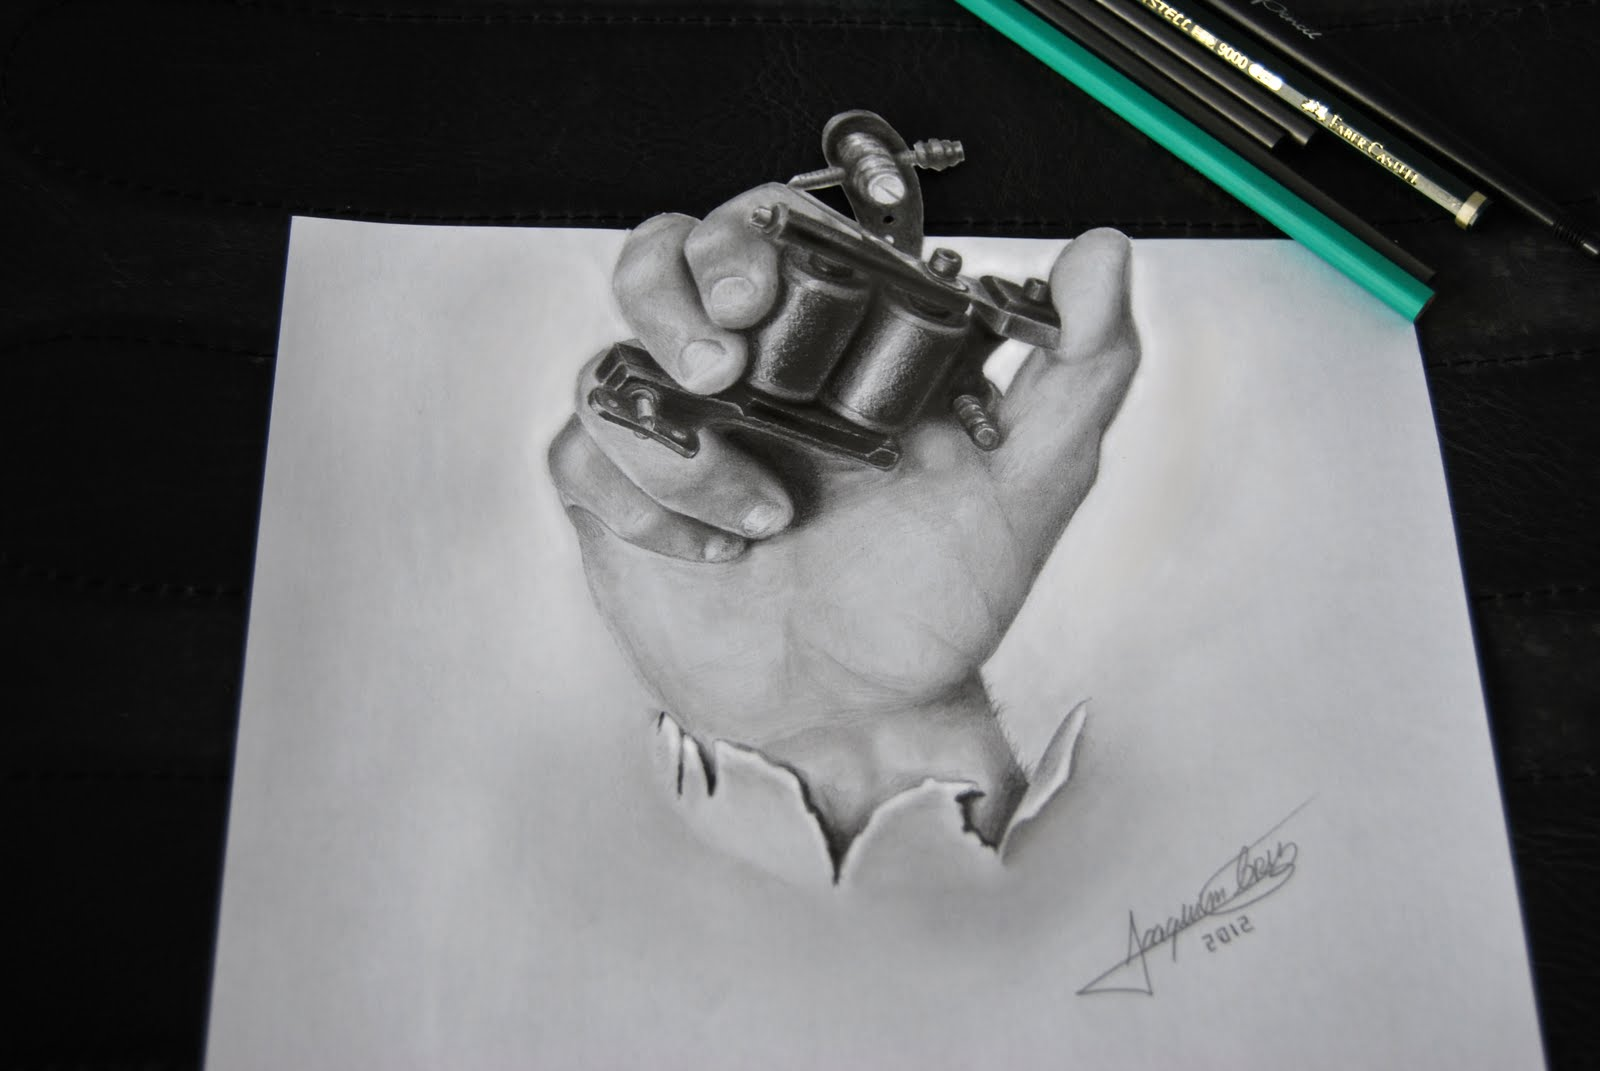 Realistic 3D Draw by Joaquim Cruz Tattoo Power